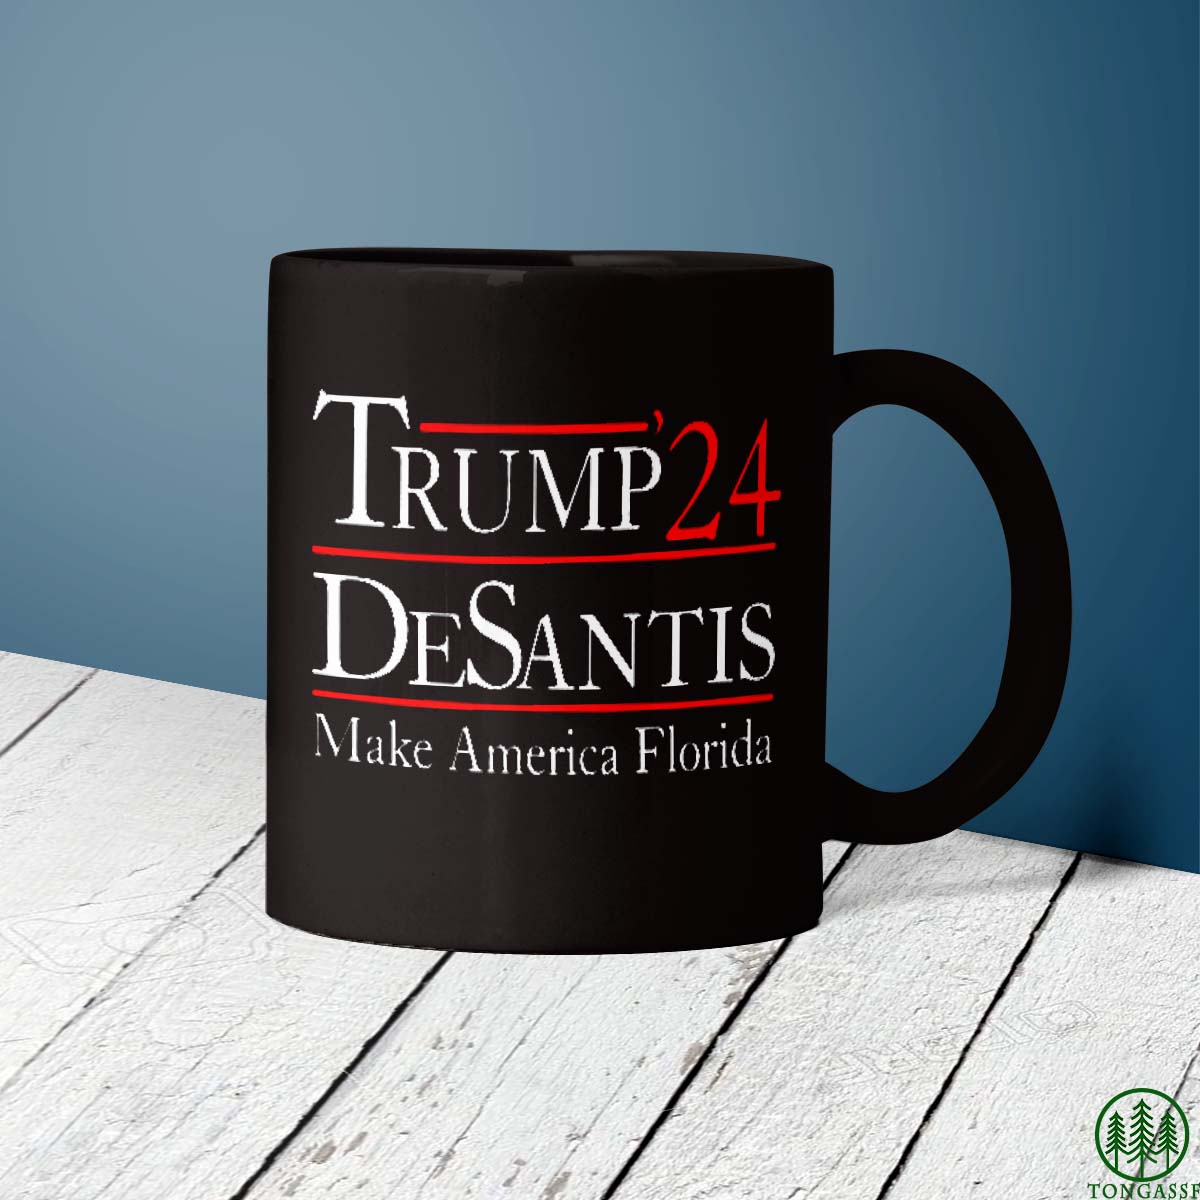 Trump 2024 DeSantis Make America Florida Mug